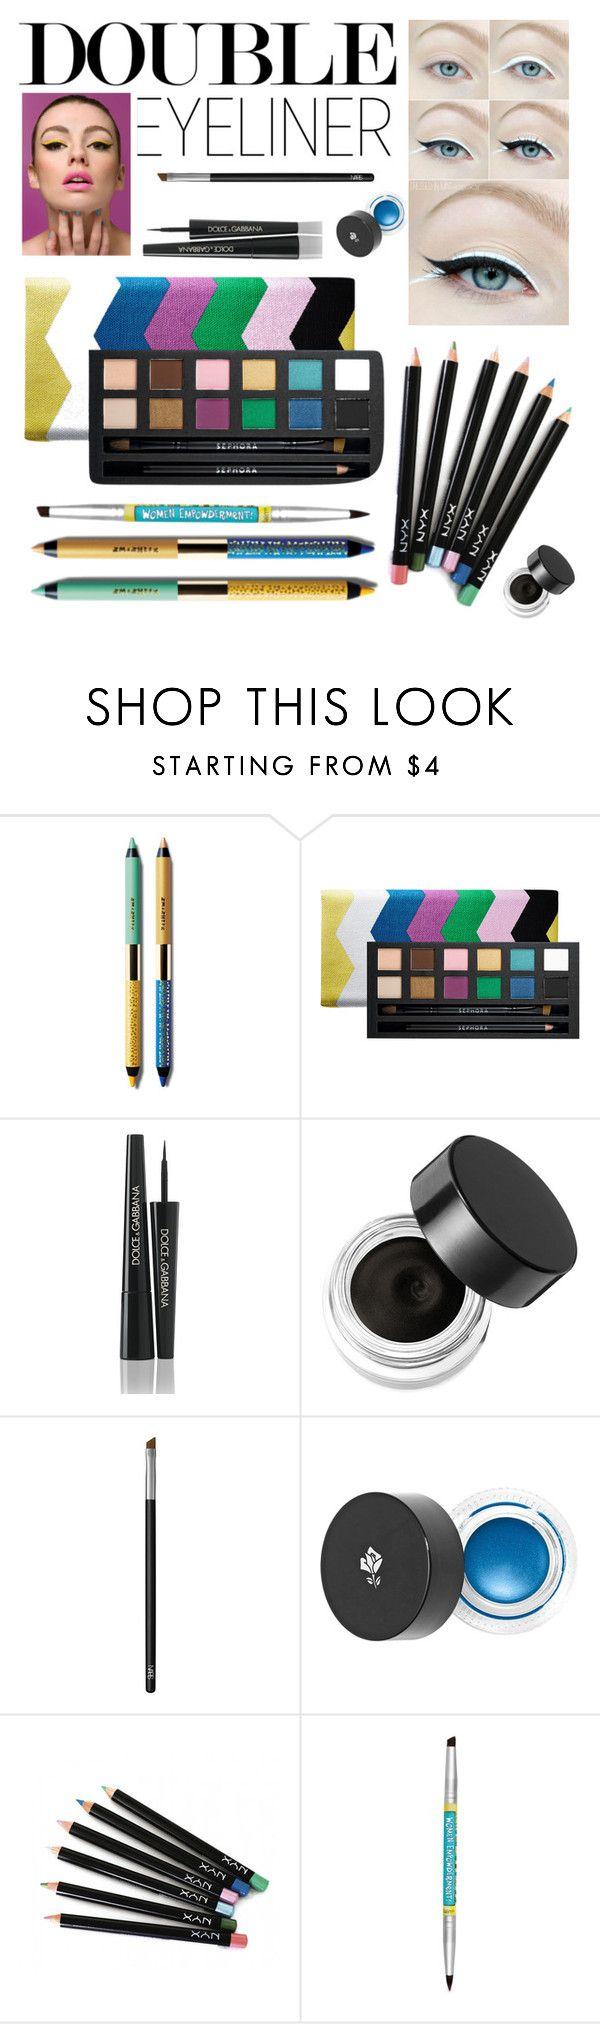 """Double Eyeliner"" by stylebycharlene on Polyvore featuring beauty, Smashbox, Sephora Collection, Dolce&Gabbana, Napoleon Perdis, NARS Cosmetics, Lancôme and NYX"